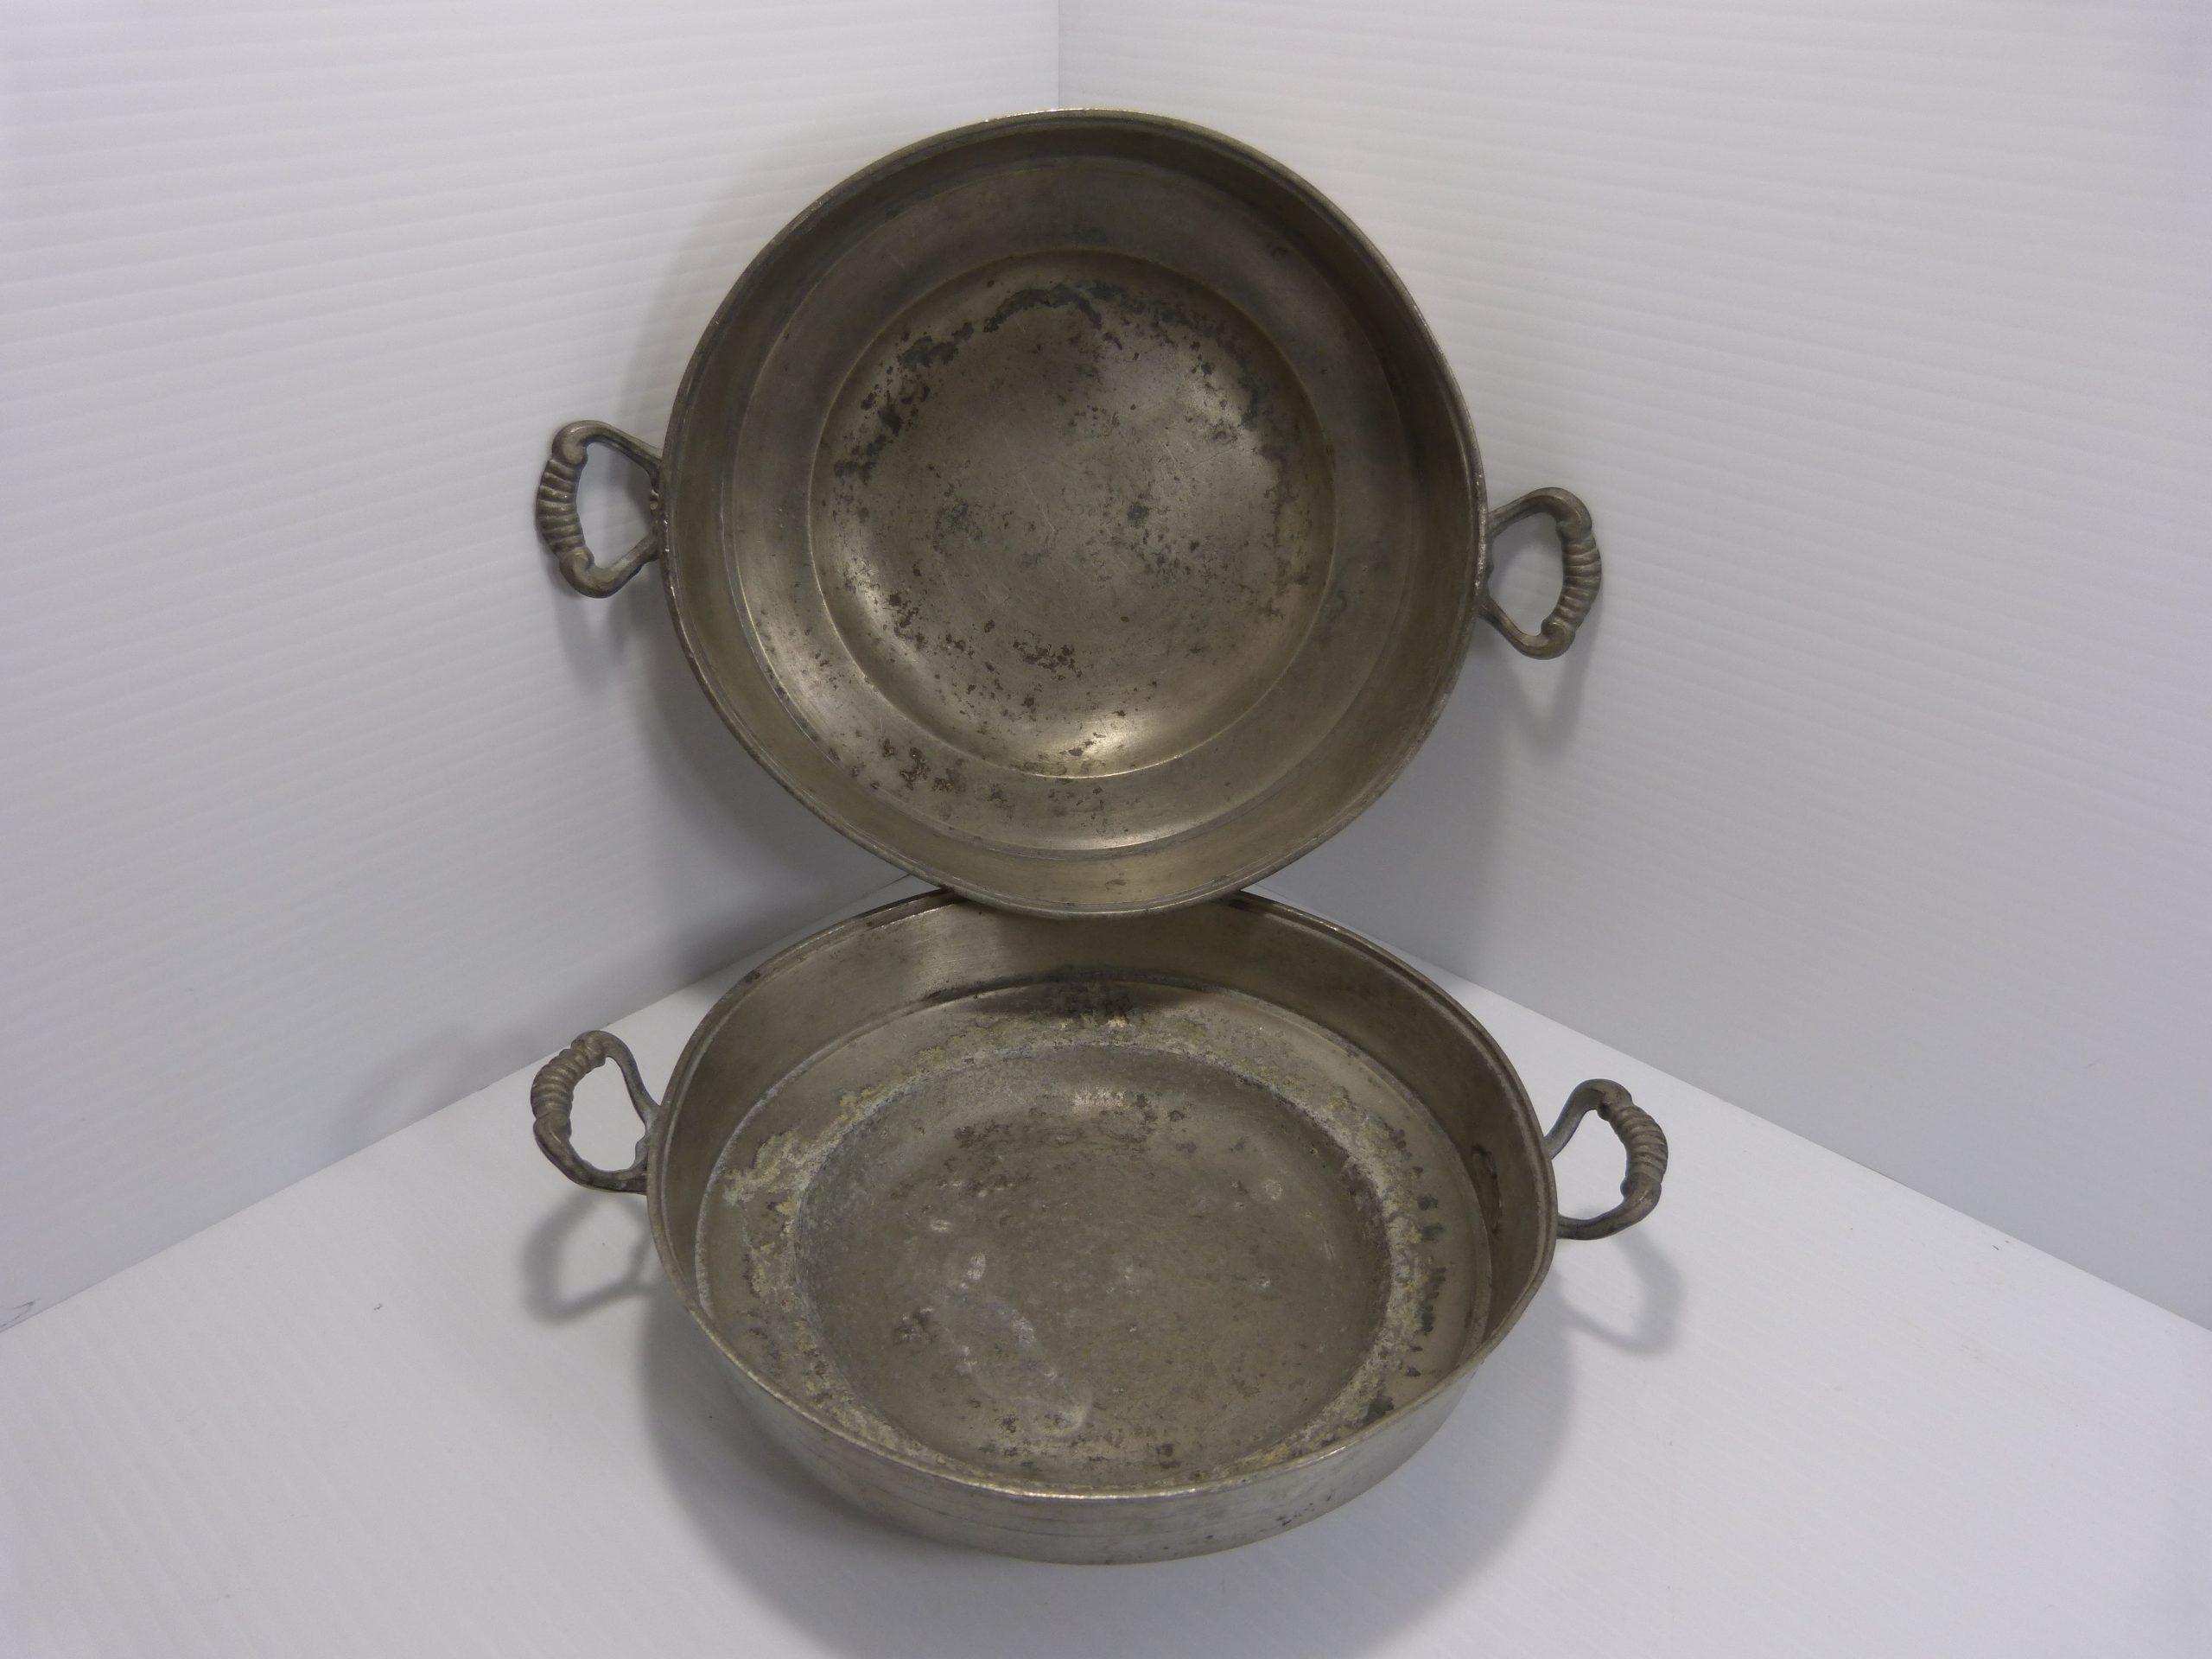 "Antique Pewter Bowls 11 x 8 1/4"" 1791"